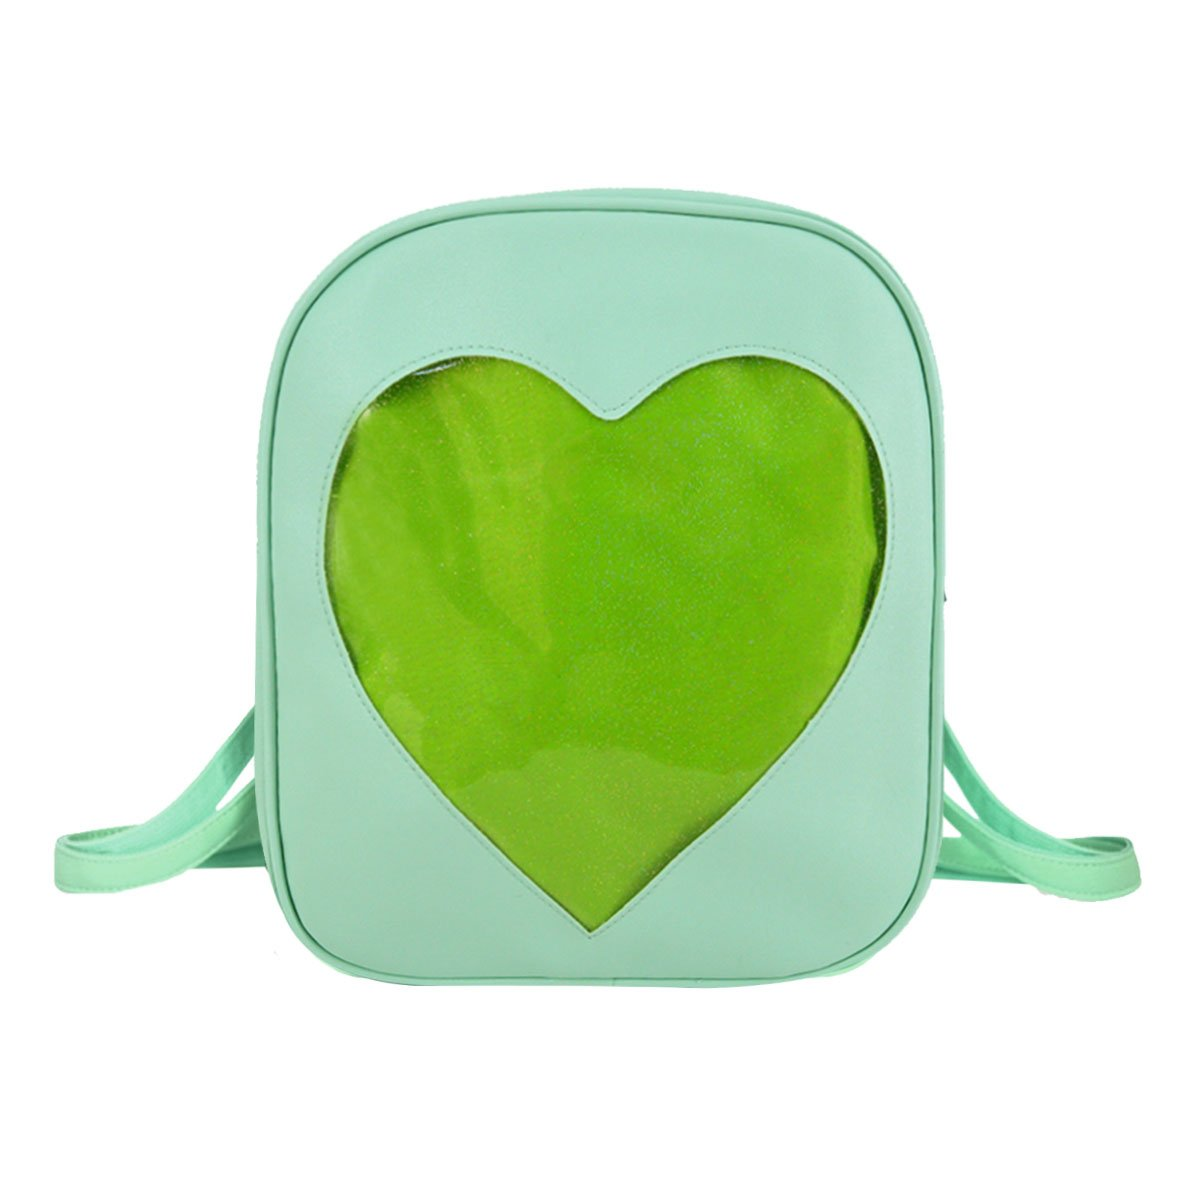 Heidi Bag Clear Candy Backpacks Teenager Ita Bag Transparent Love Heart School Bags Girls Kids Satchel